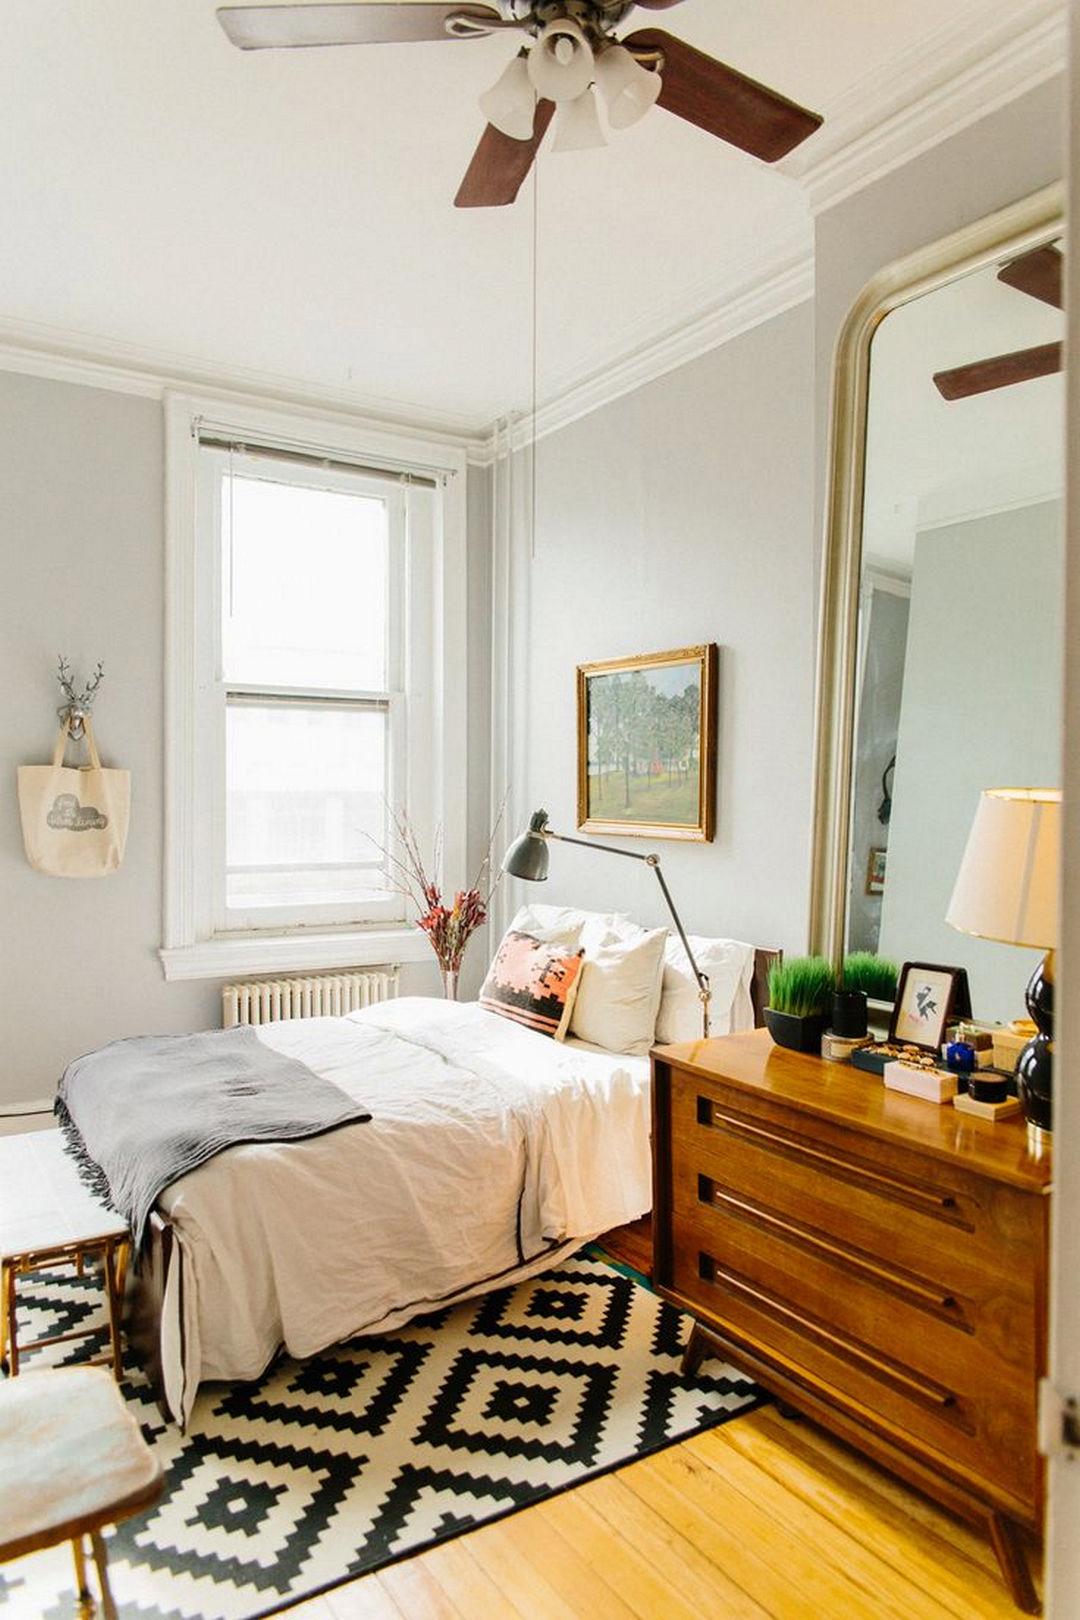 80 Cozy Small Bedroom Interior Design Ideas The giants Design